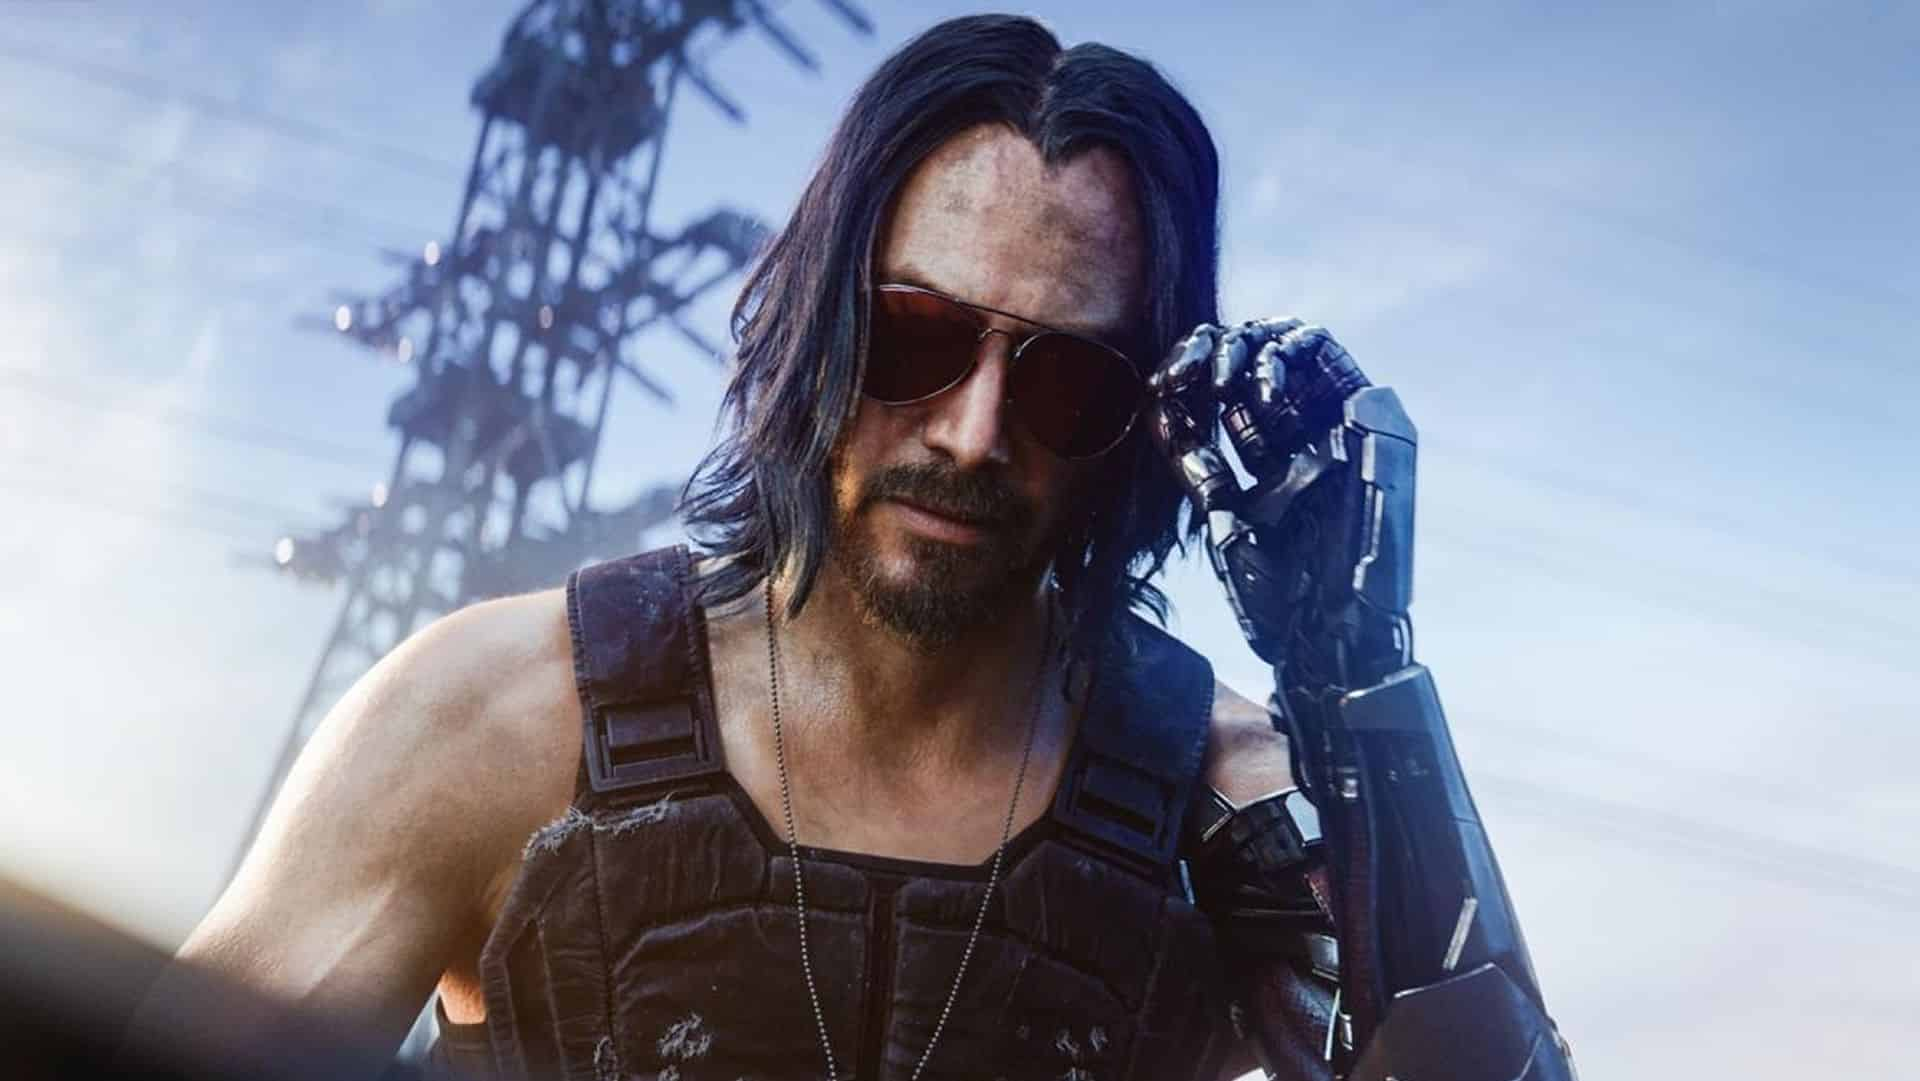 cyberpunk 2077 DLC Third-Person Mod trophies development cd projekt red Xbox One X Series X Gameplay Keanu Reeves Streamer-friendly mode PS5 Gameplay